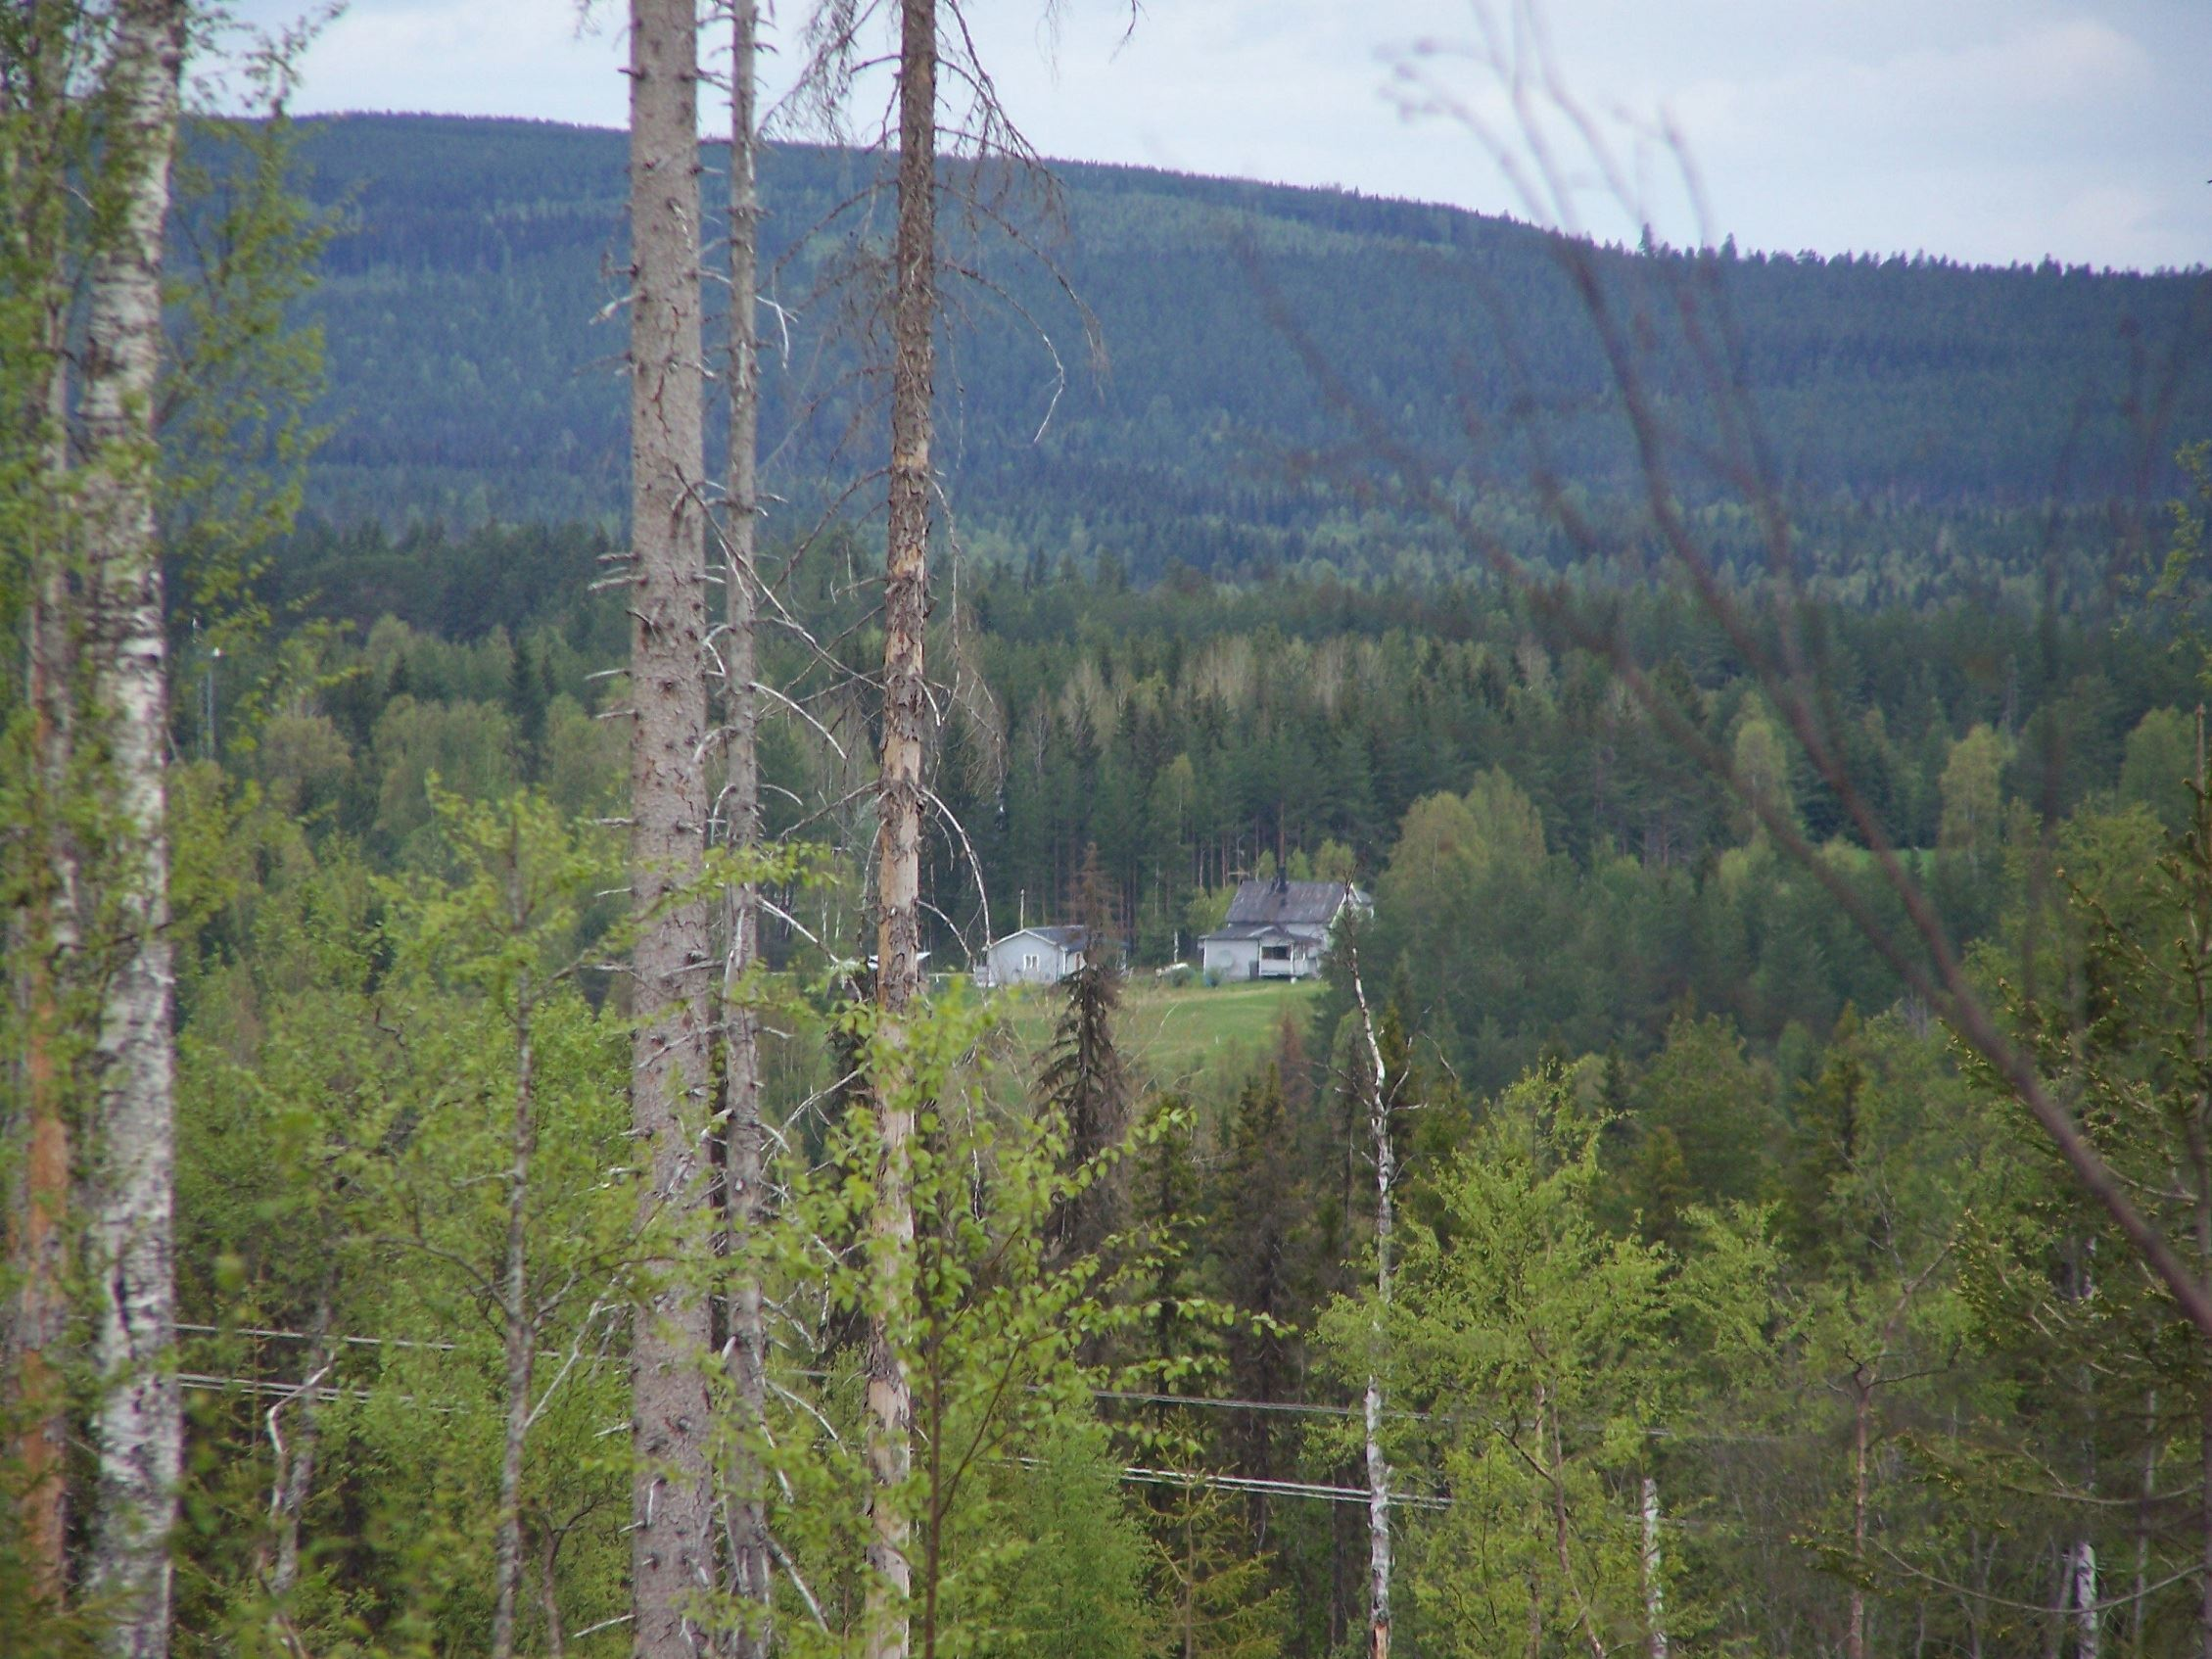 Lillterrsjö Campsite